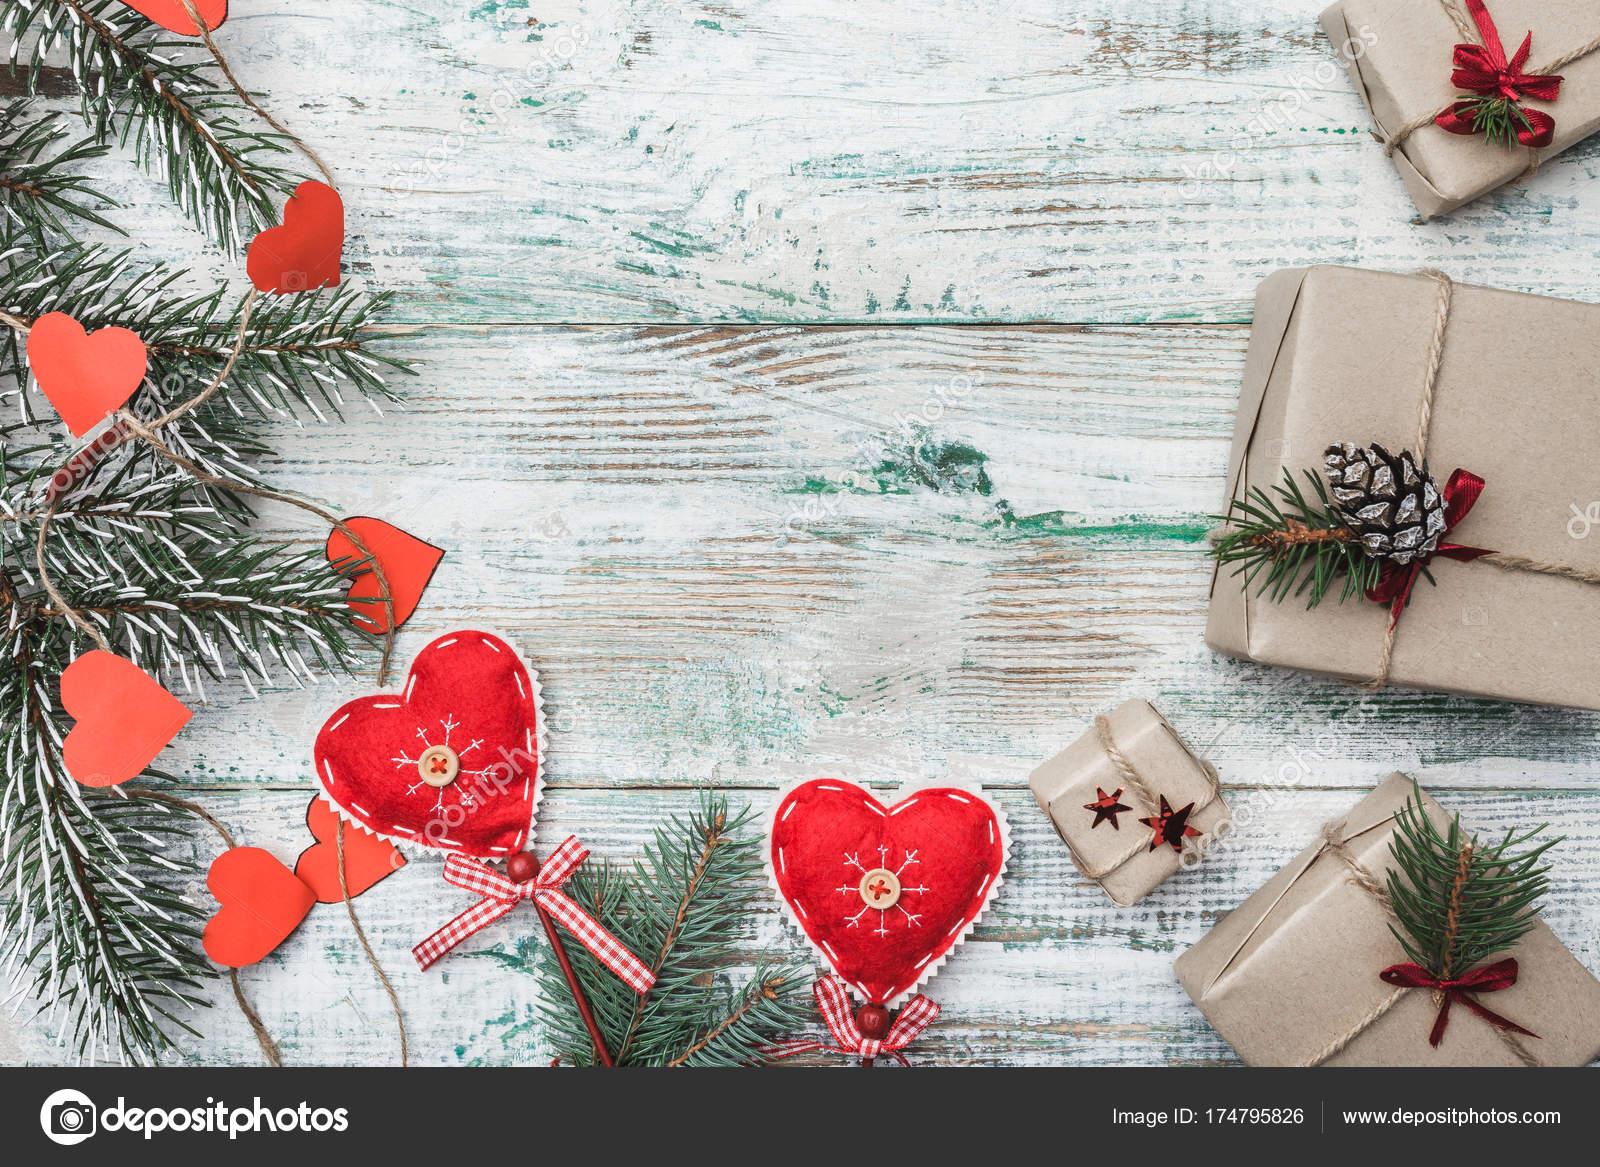 Red Hearts Handmade Greeting Card Christmas Christmas New Year Xmas